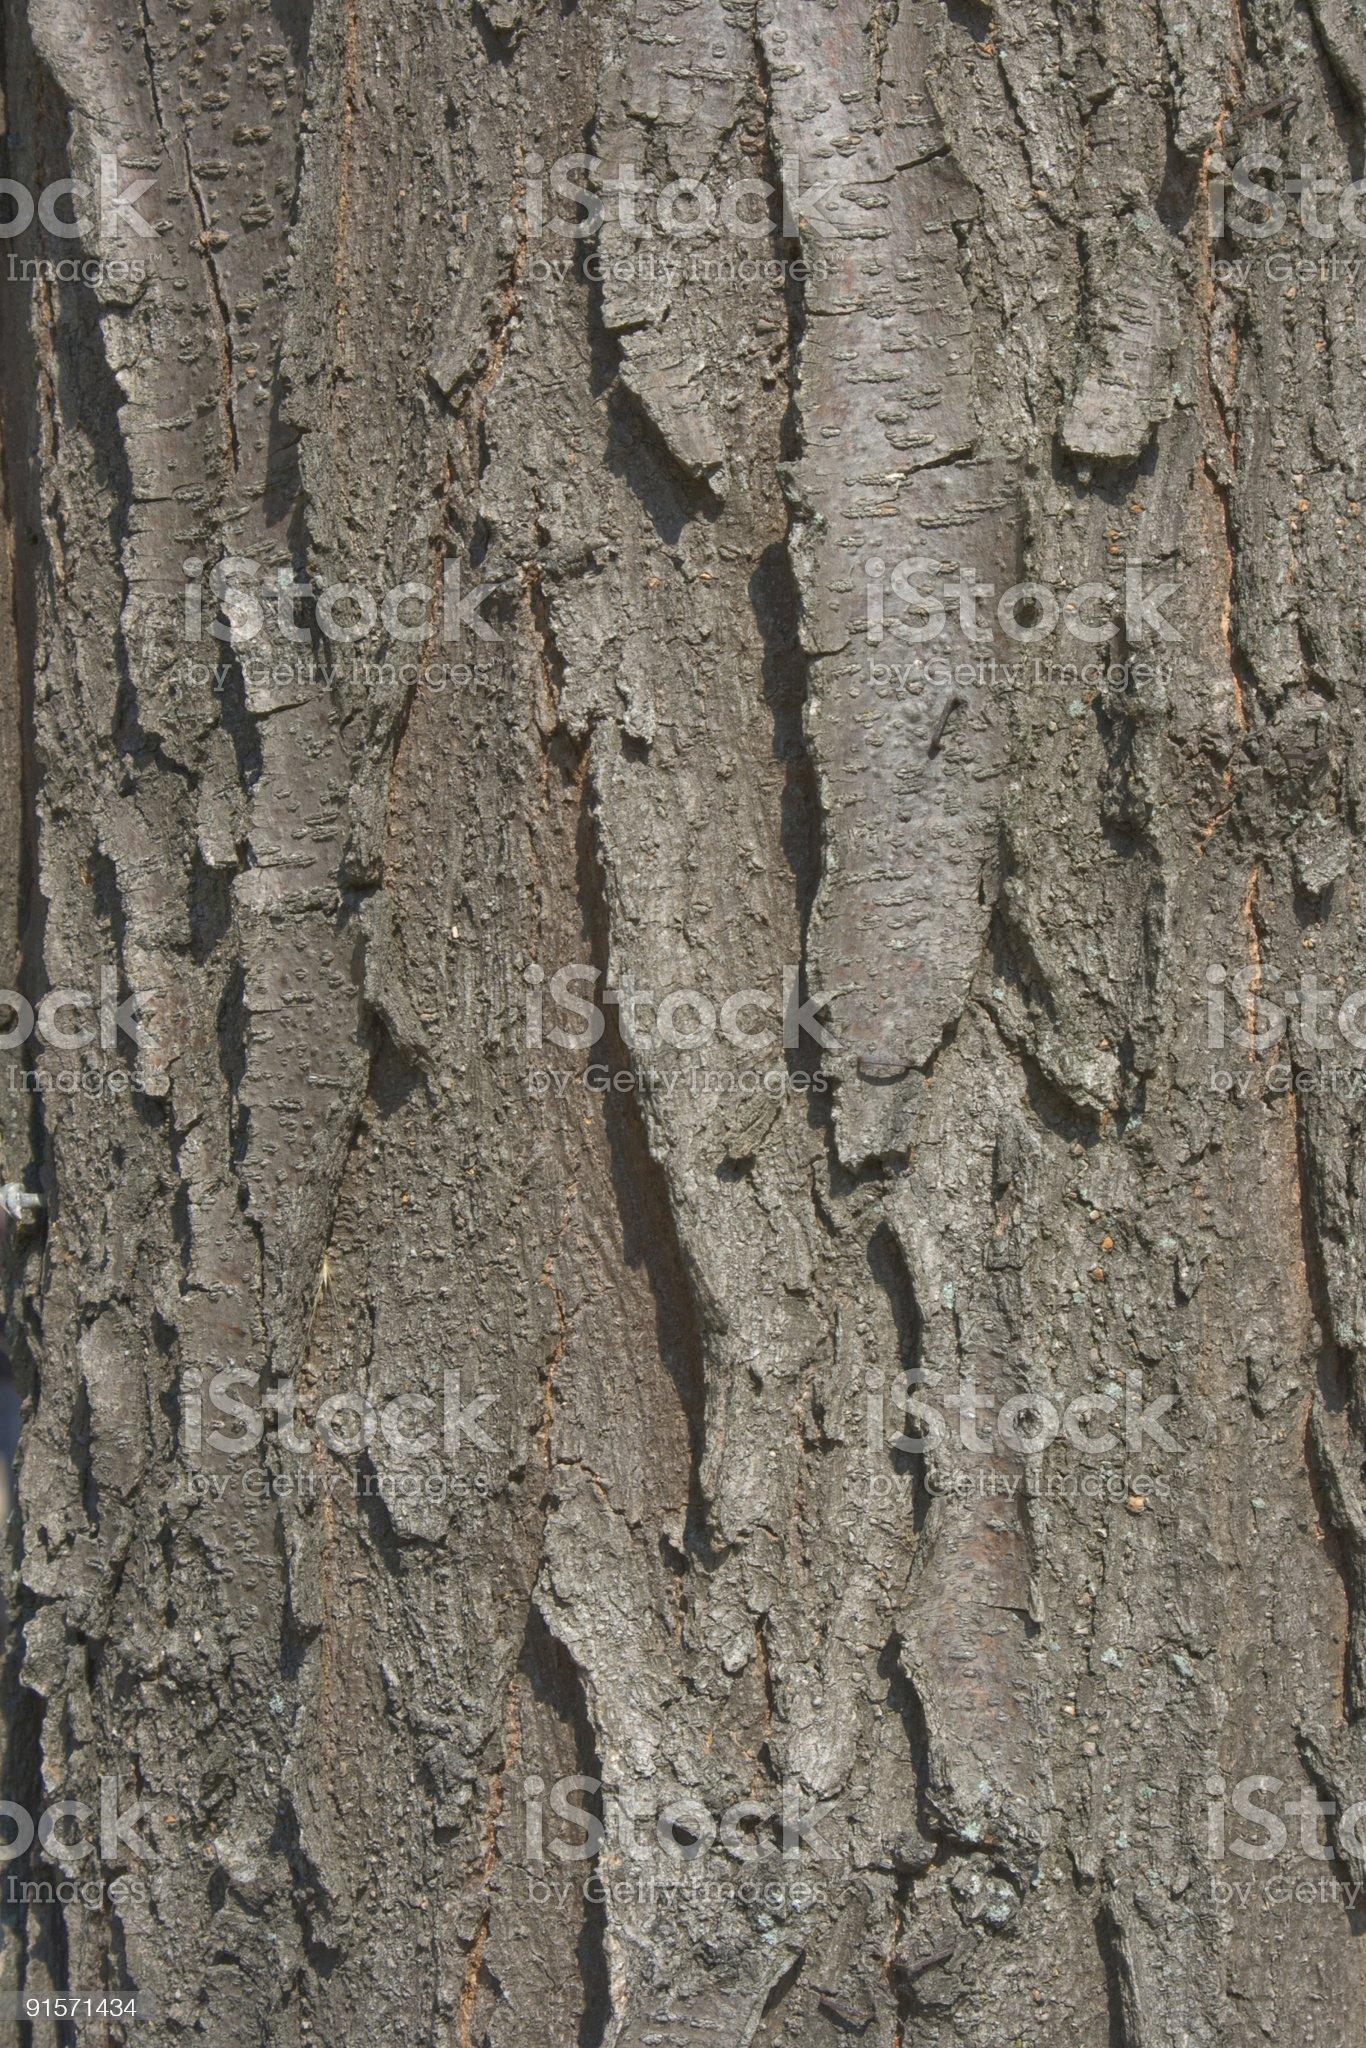 Black Locust Bark Background royalty-free stock photo